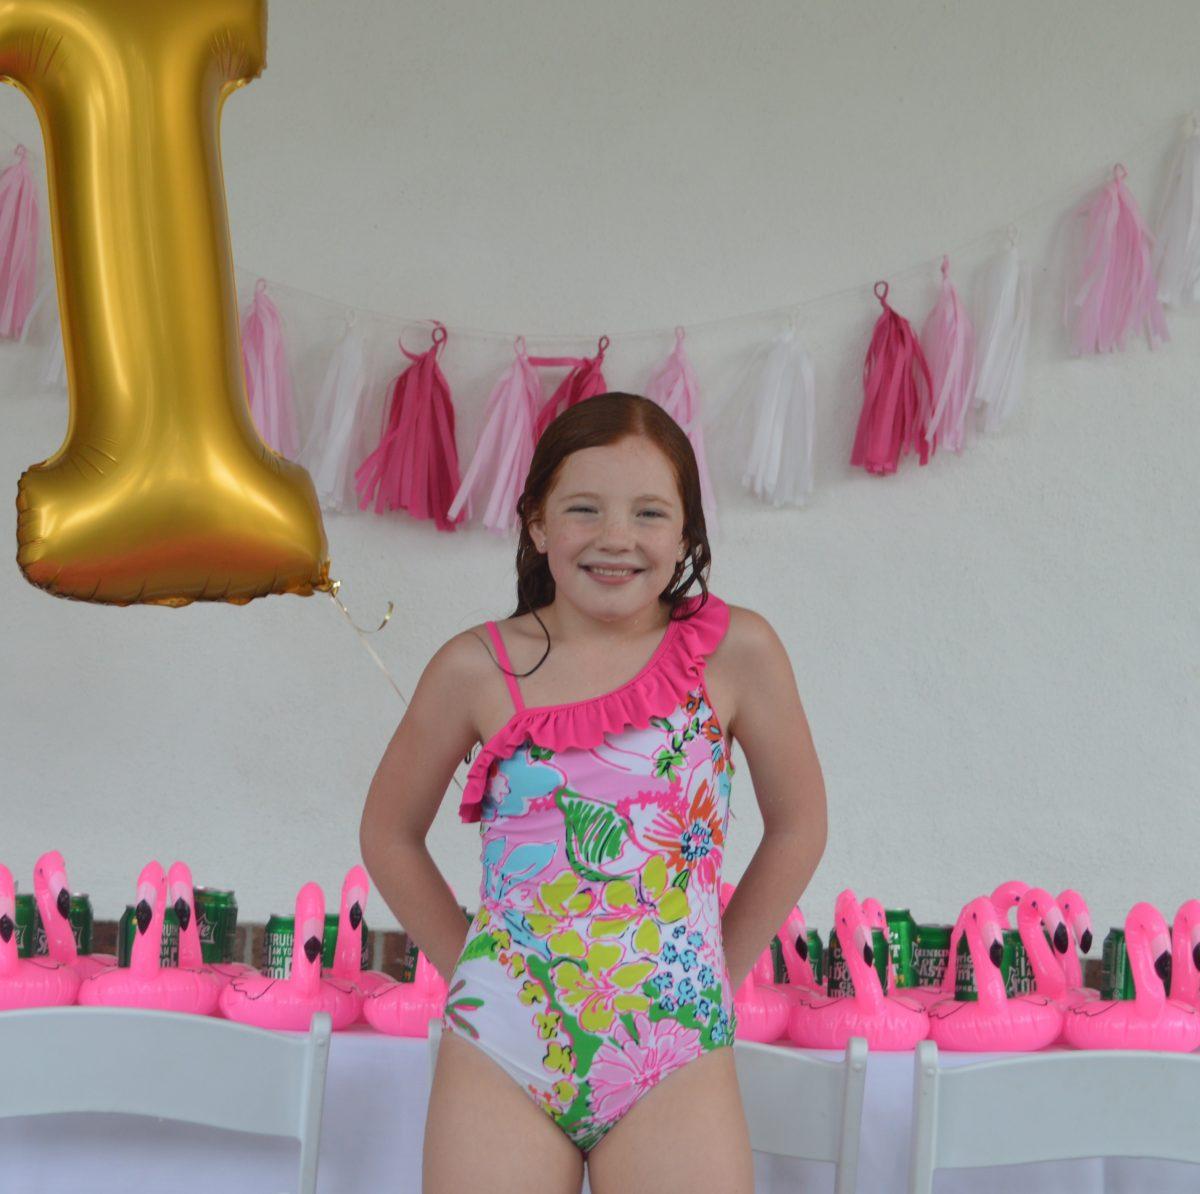 Harper's Pink Flamingo Pool Party